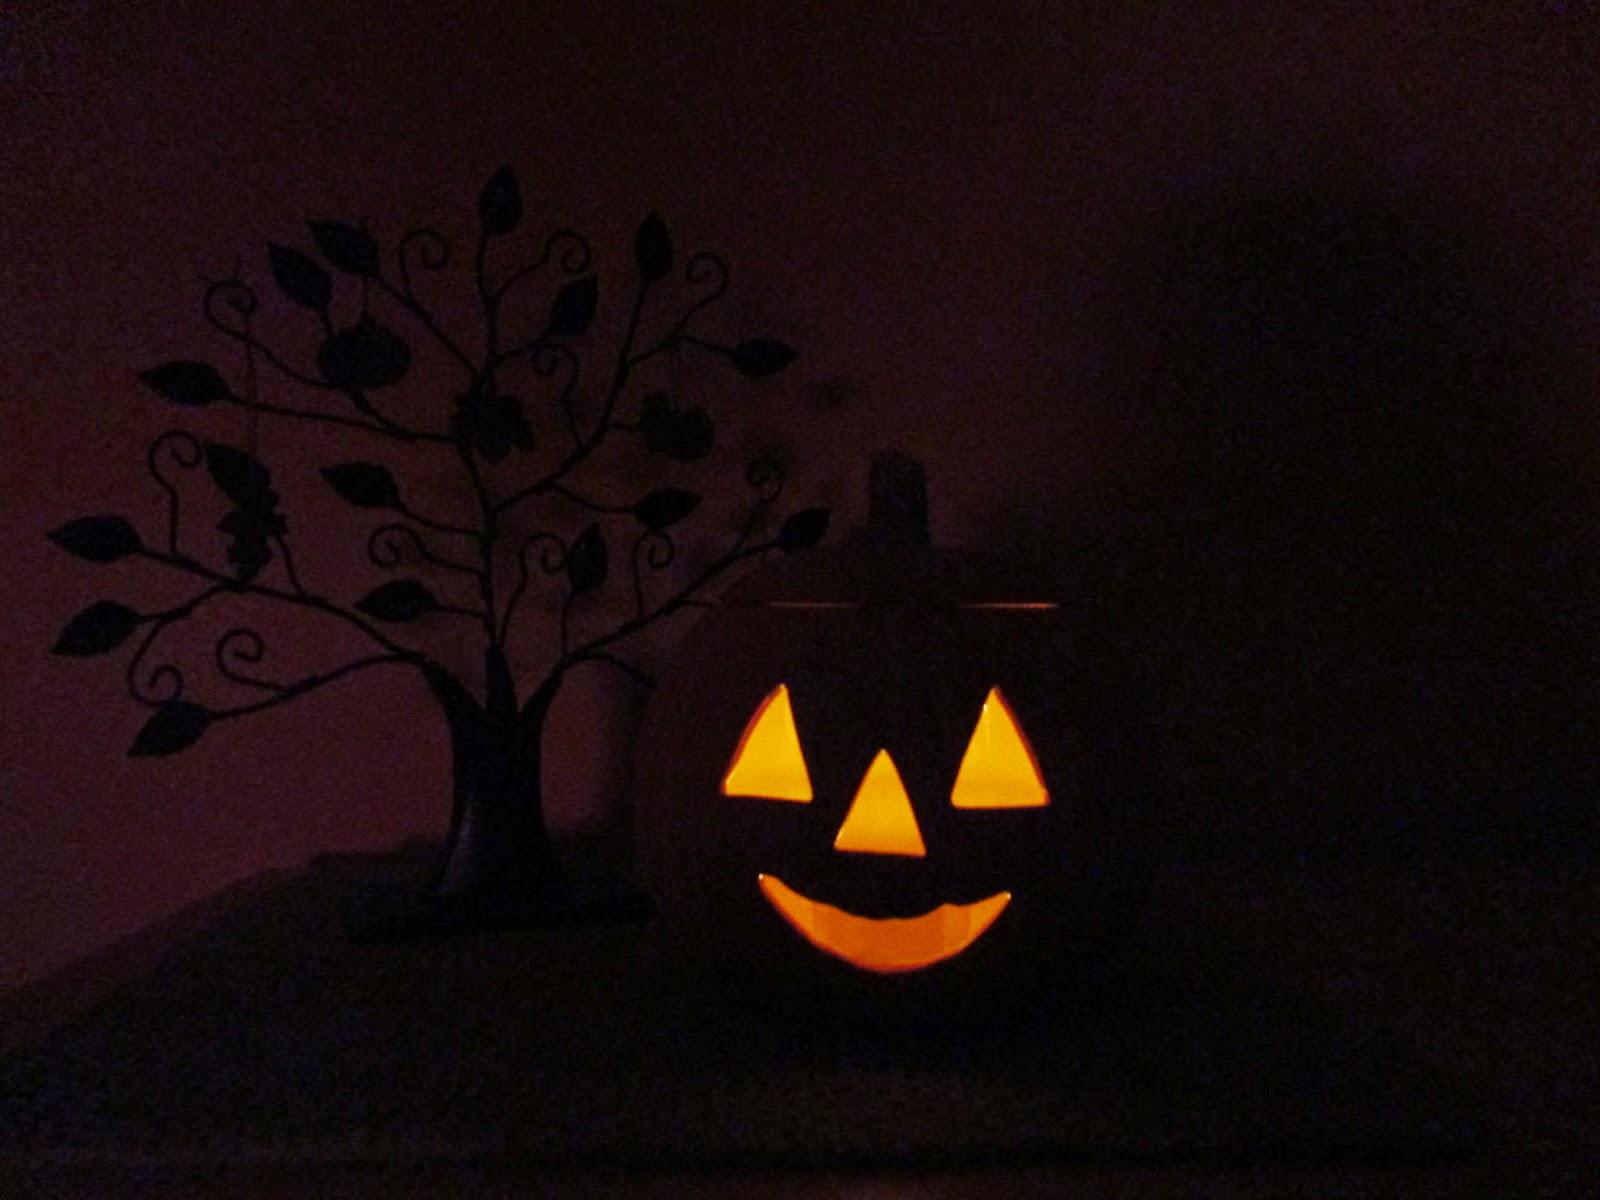 halloween jack-o-lantern movies